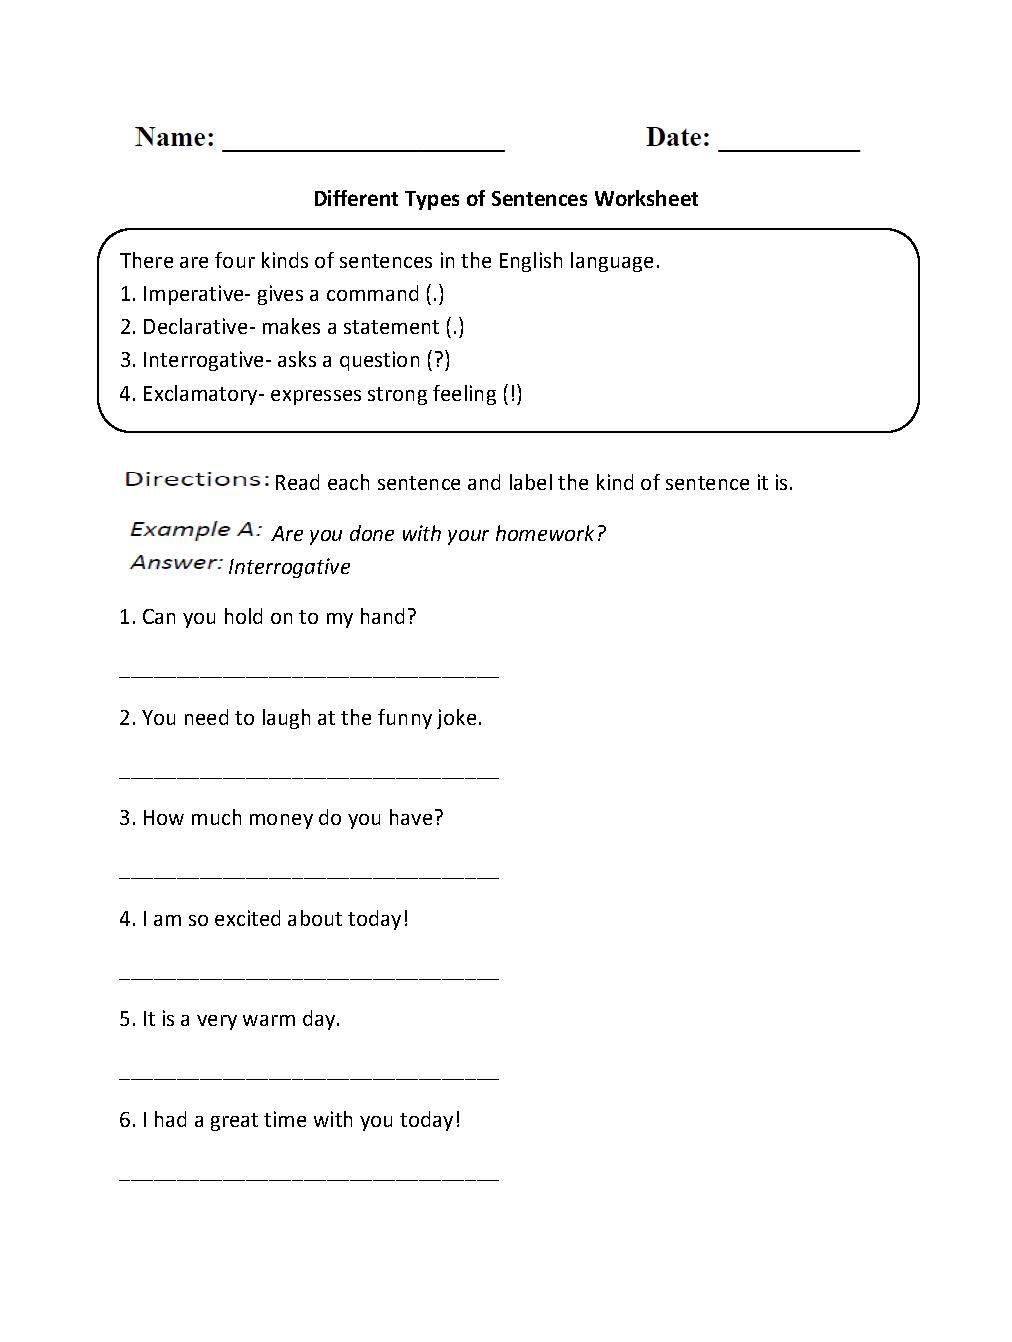 Different Types of Sentences Worksheet | Types of sentences ...